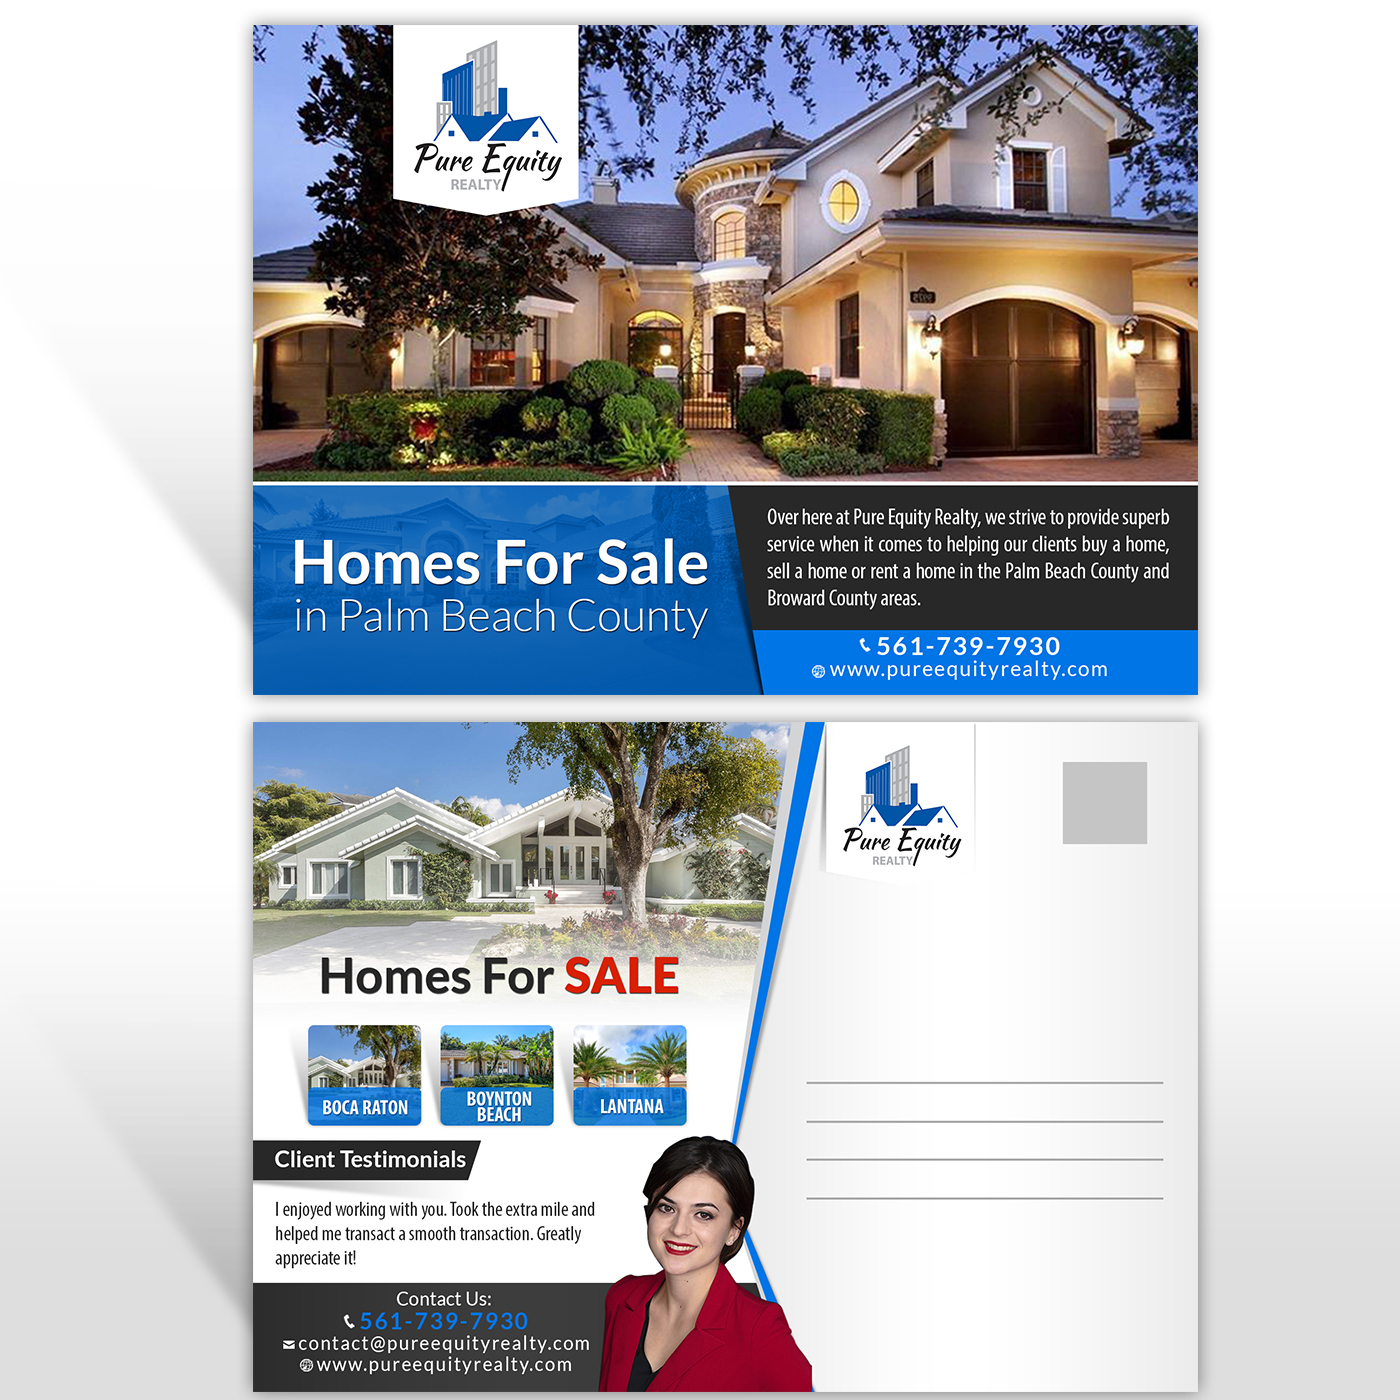 elegant playful real estate flyer design for a company by hih7